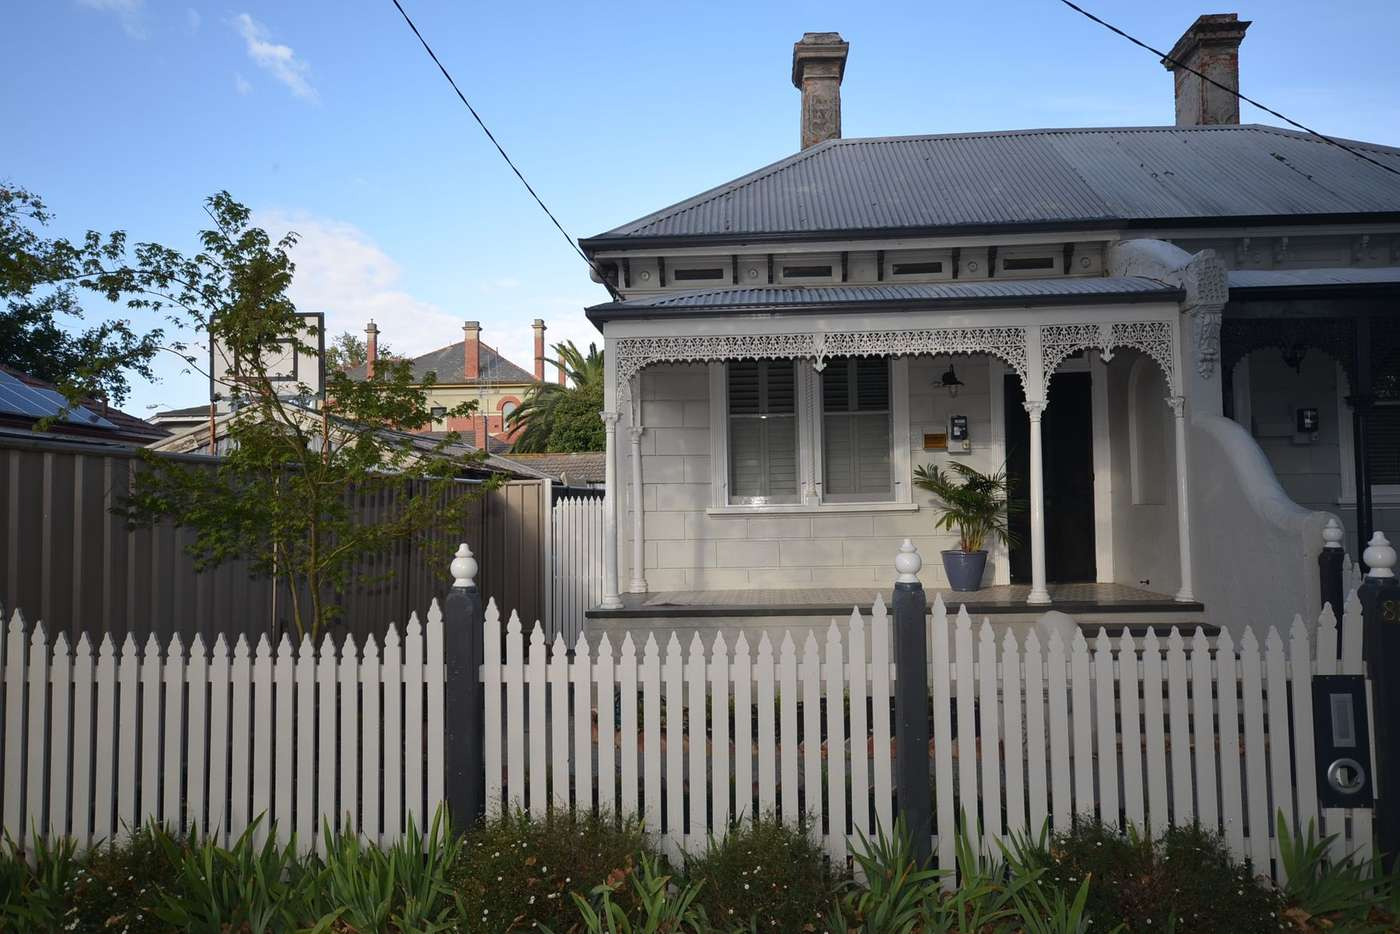 Main view of Homely house listing, 81 Baxter Street, Bendigo VIC 3550